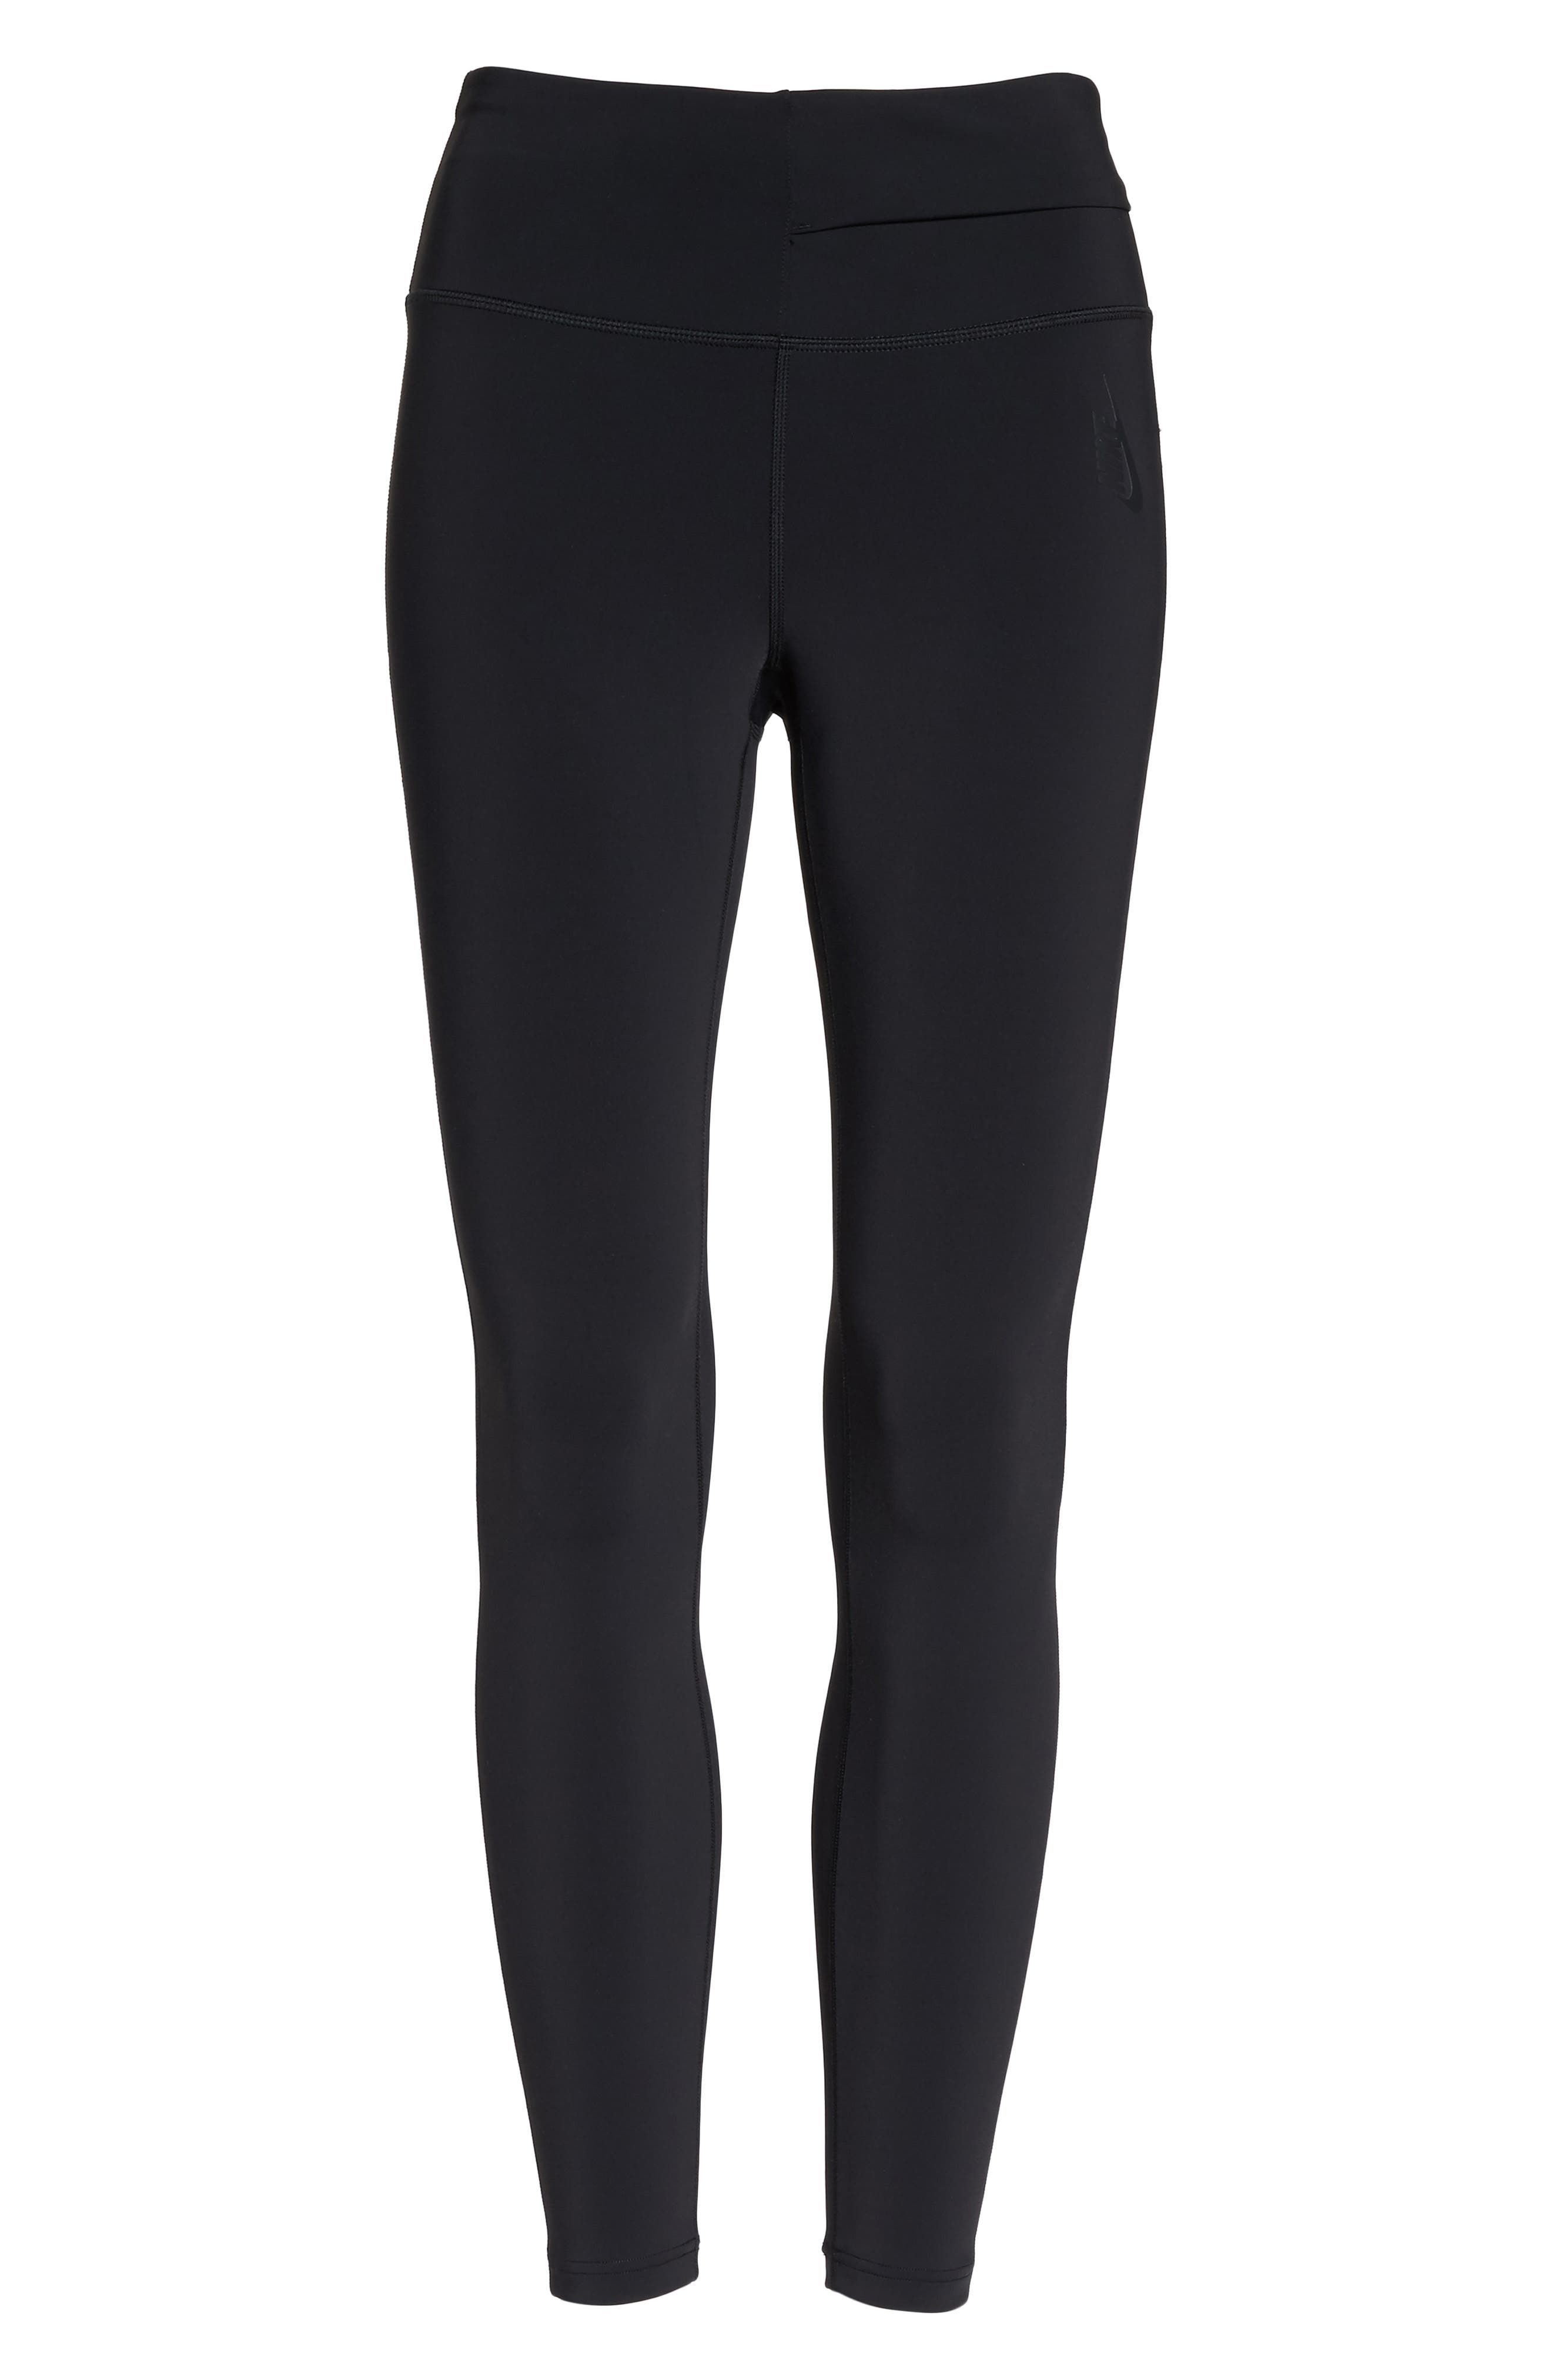 NikeLab Women's Tights,                             Alternate thumbnail 7, color,                             BLACK/ BLACK